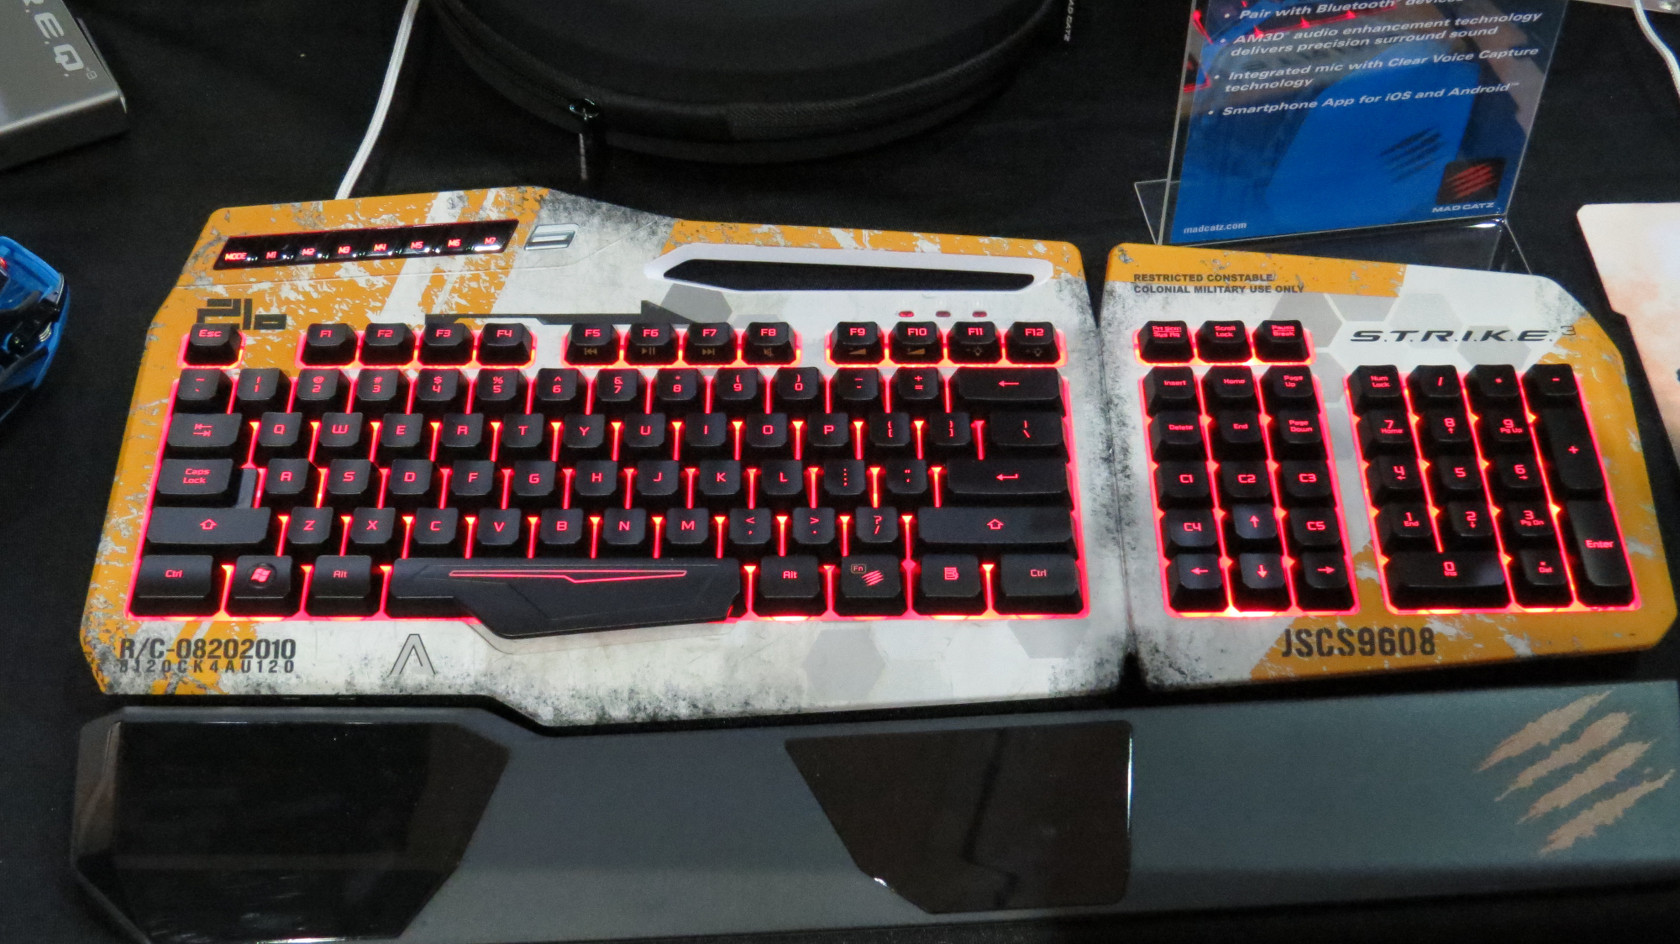 madcatz-titanfall-strike3-keyboard.jpg